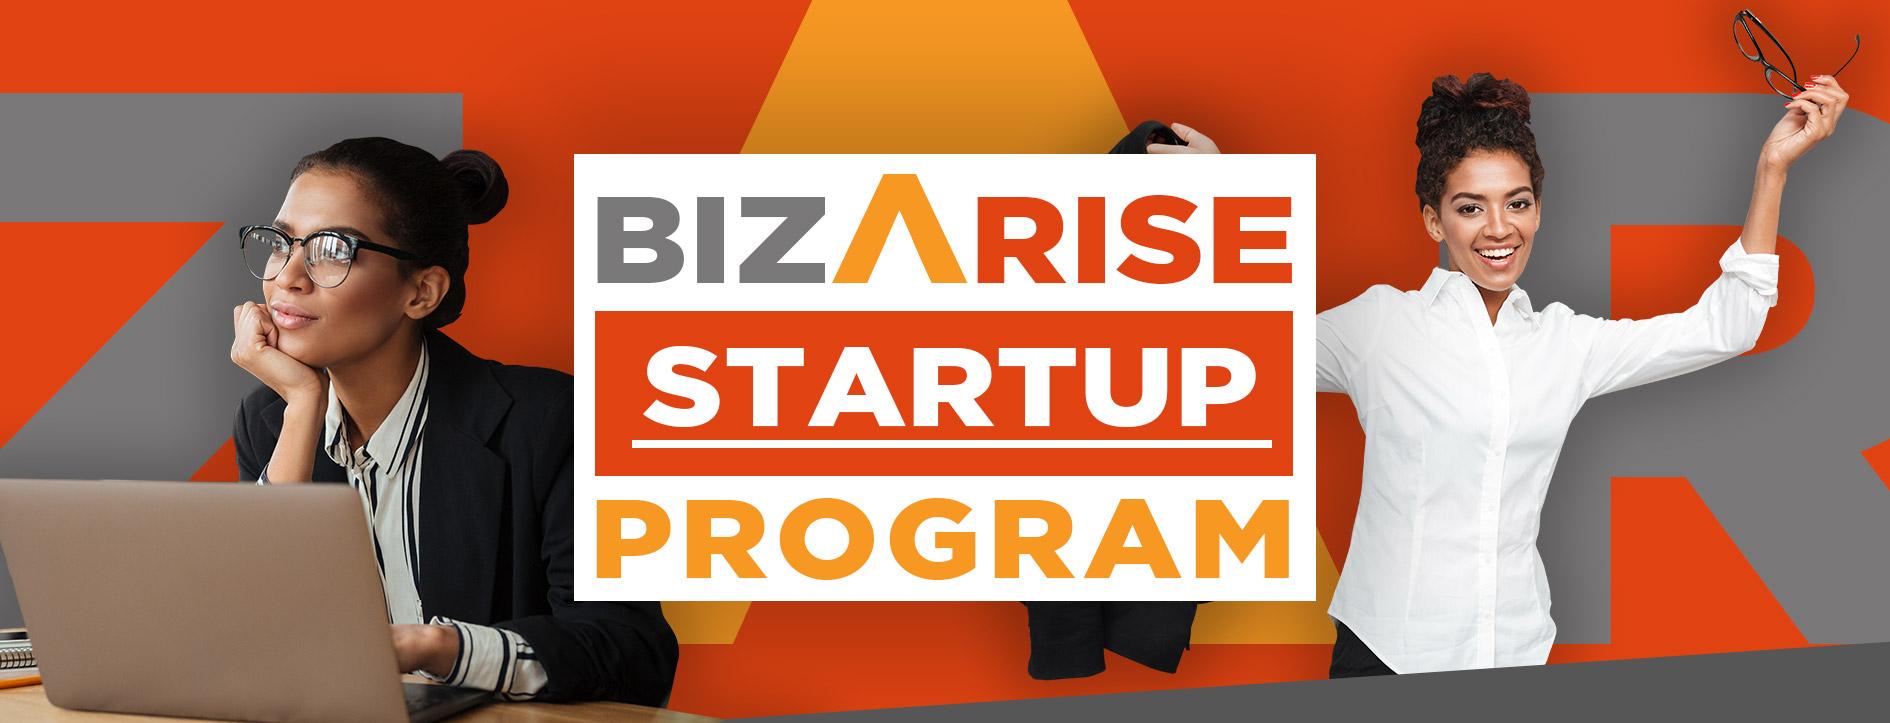 BizArise Startup Program 2020 Website Event Banner